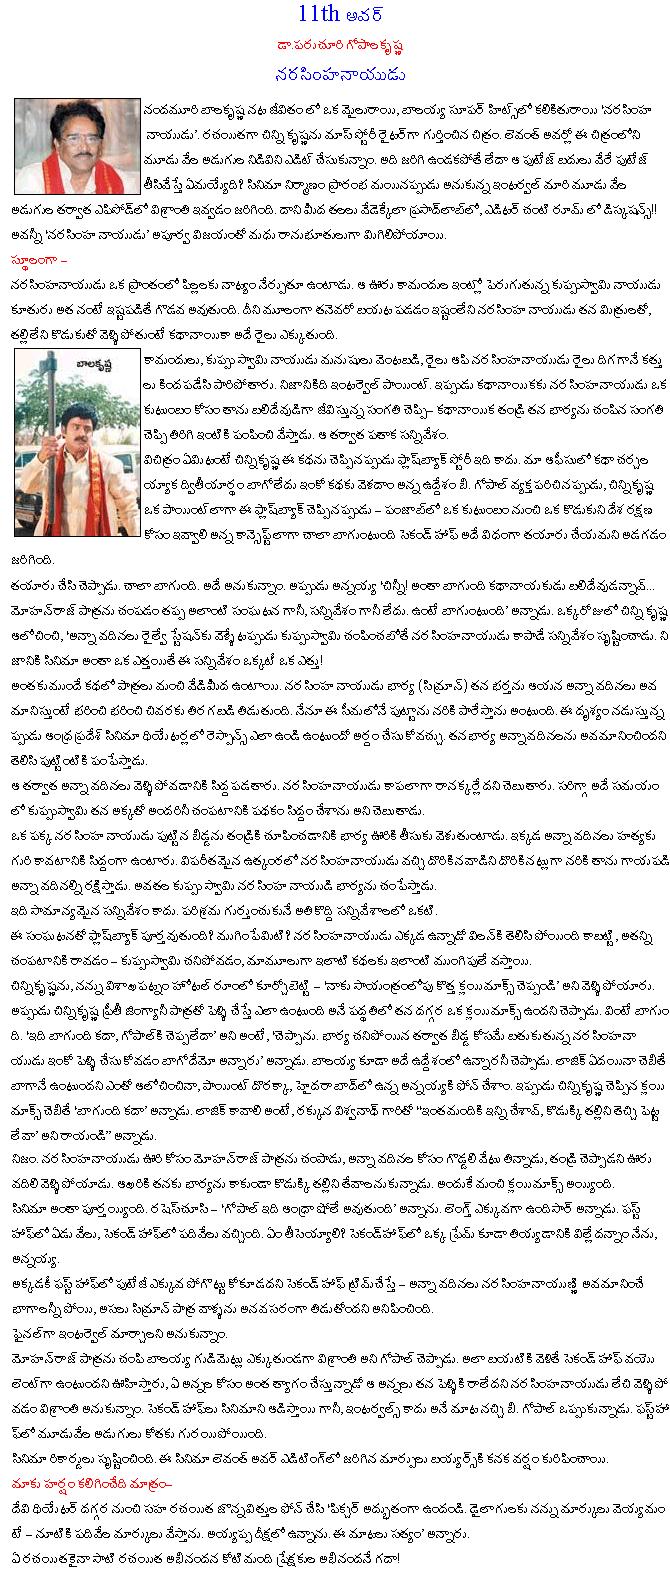 Narasimhanaidu mainicle